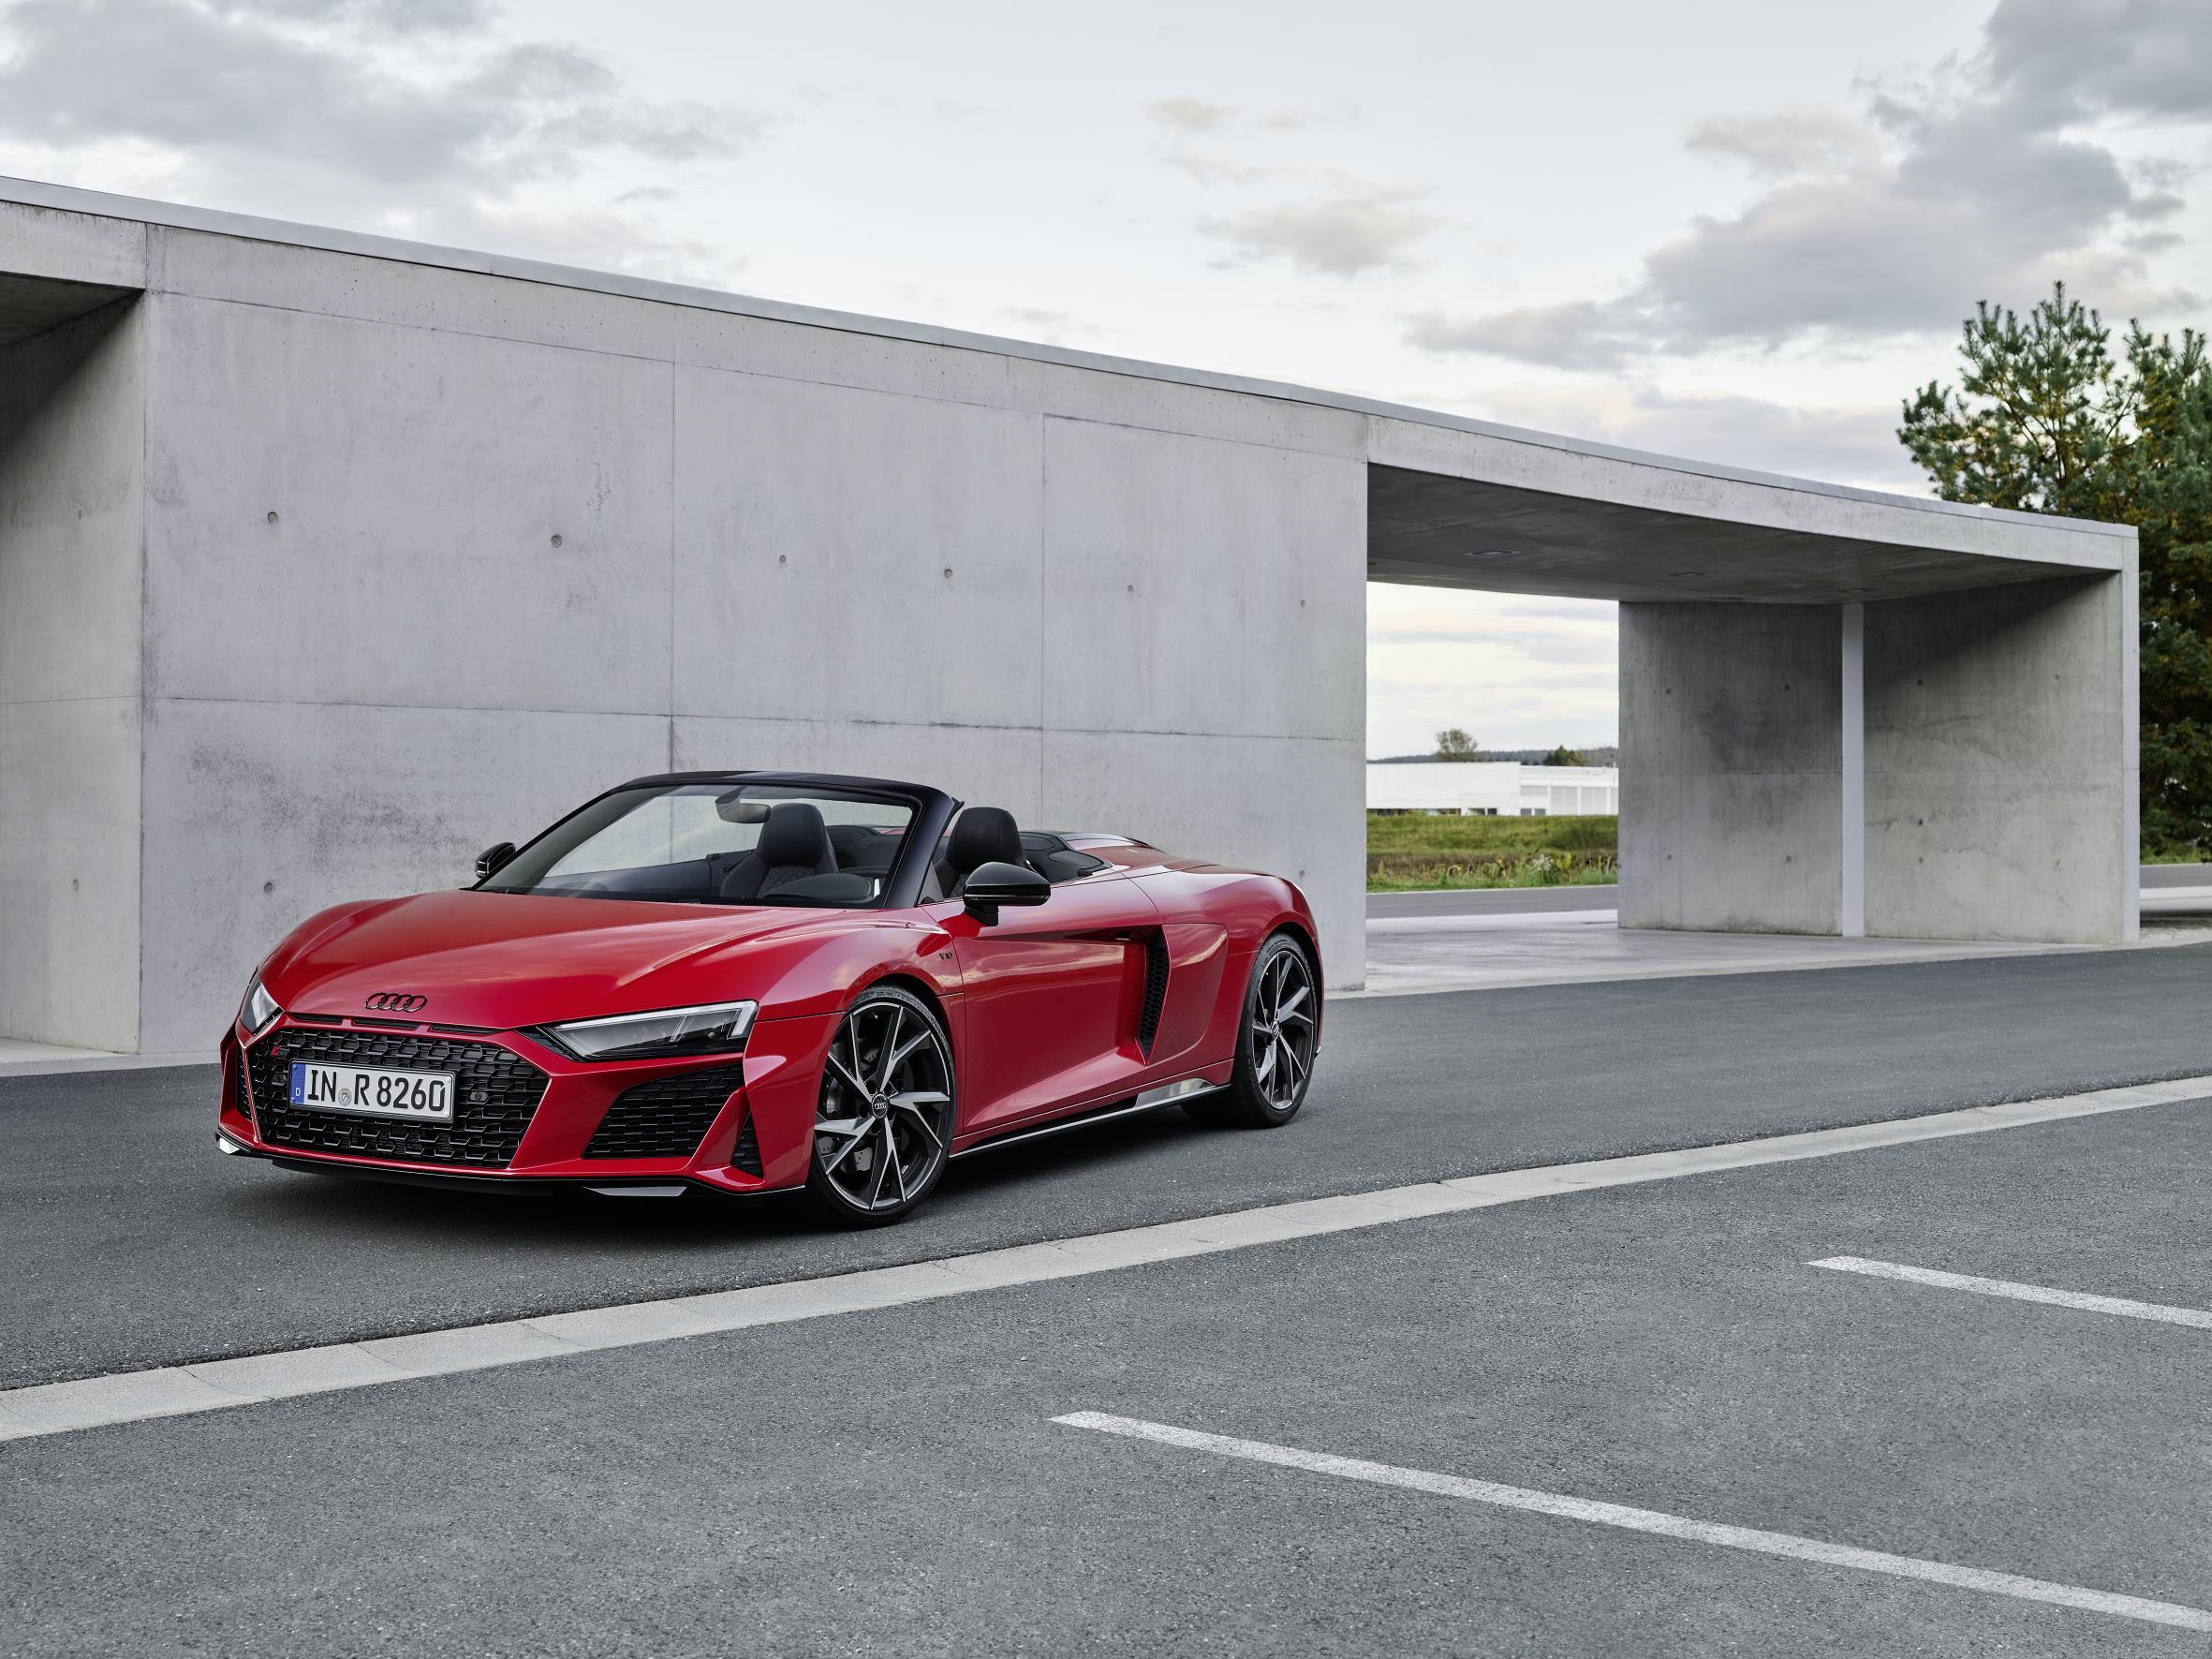 2020 Audi R8 RWD Spyder Price